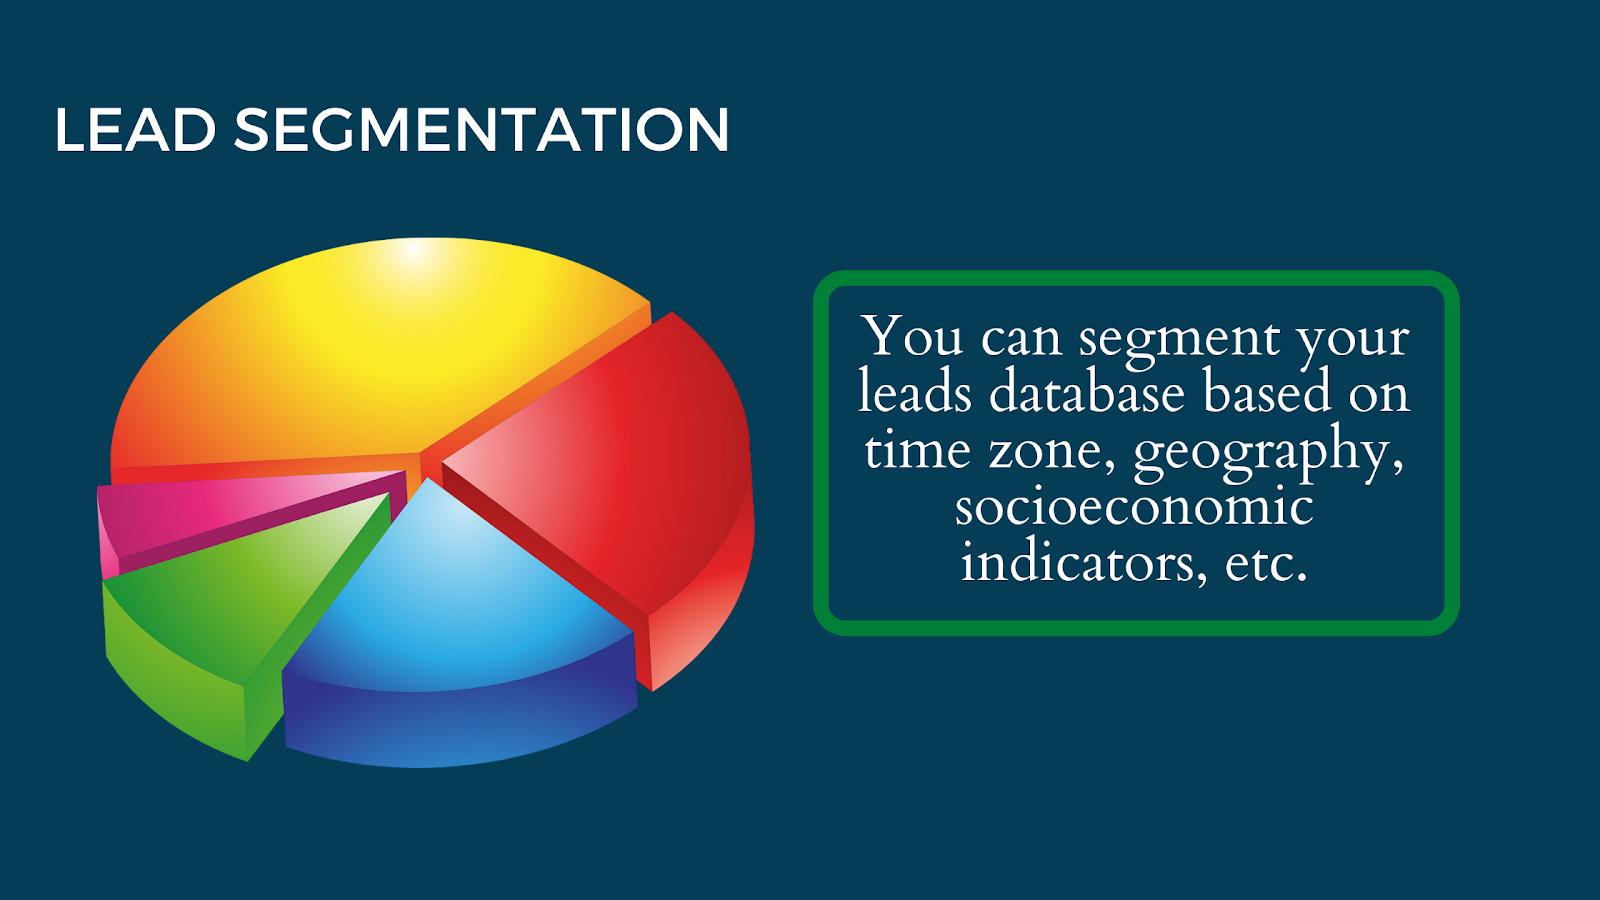 Lead Segmentation